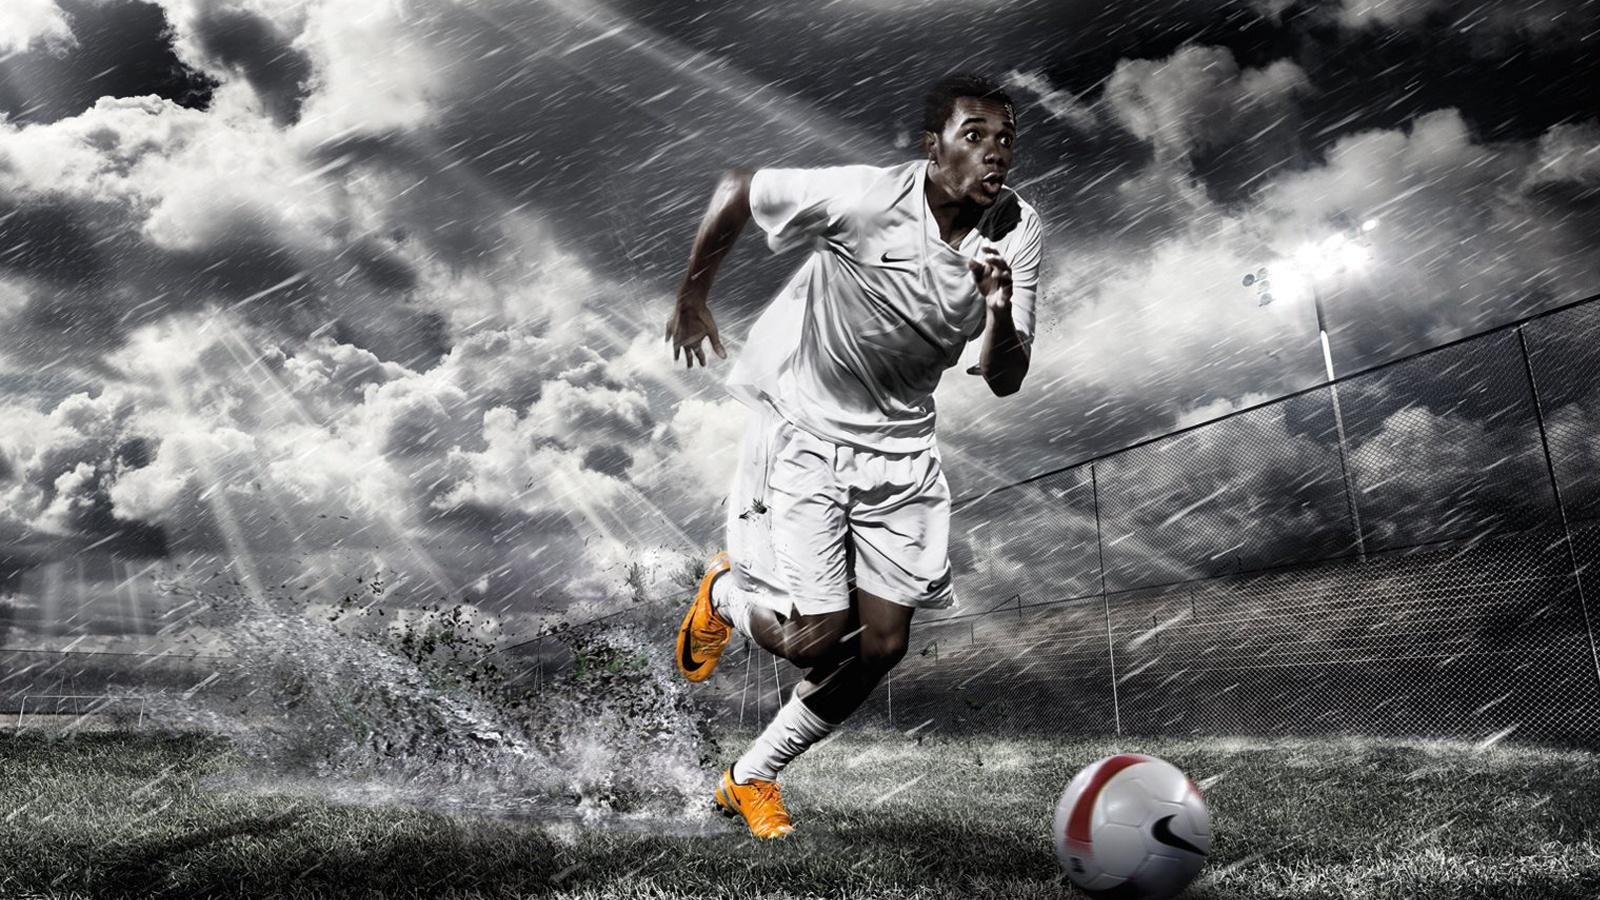 Robinho Nike Brand Wallpapers HD Wallpapers 1600x900